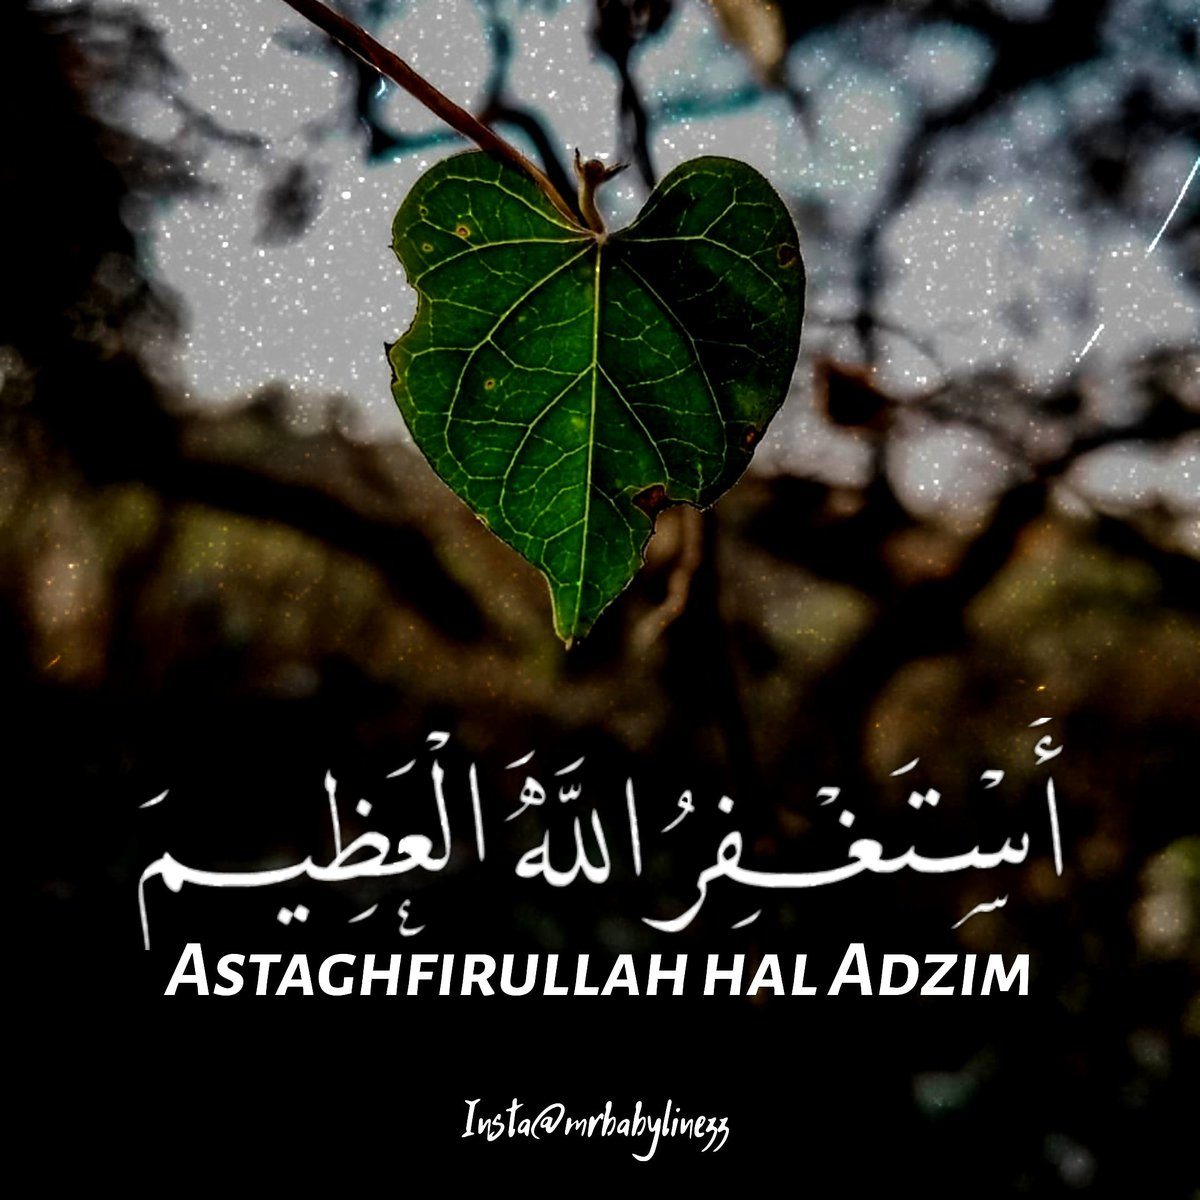 Astaghfirullah hal adzim . . . . . . . #quotestoliveby #quotesaboutlife #quoteoftheday  #katakatamuslimah #muslimcouple  #katakatamutiara #katakatahikmah #quotesandsayings #sayingsandquotes #motivationalsayings  #sadsayings #failurequotes #lovepain #sadnessquote #islamicquotepic.twitter.com/AylObq66oC